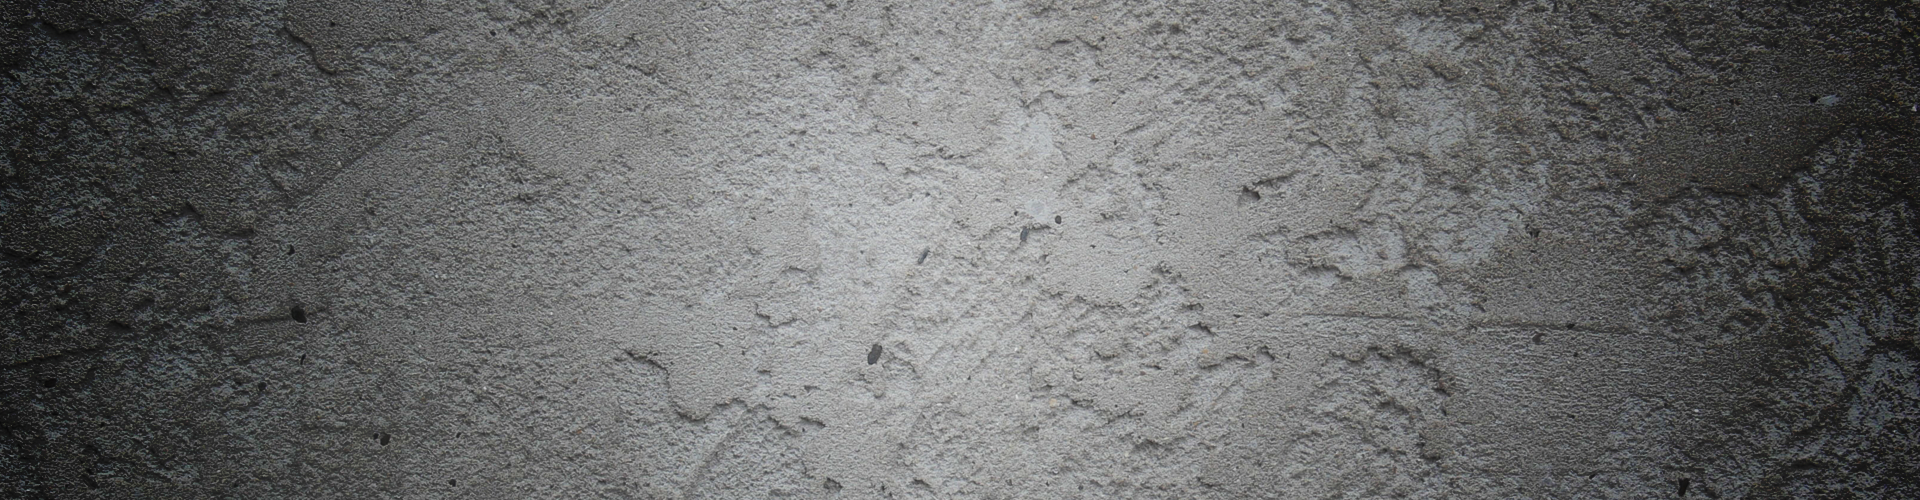 Concrete banner